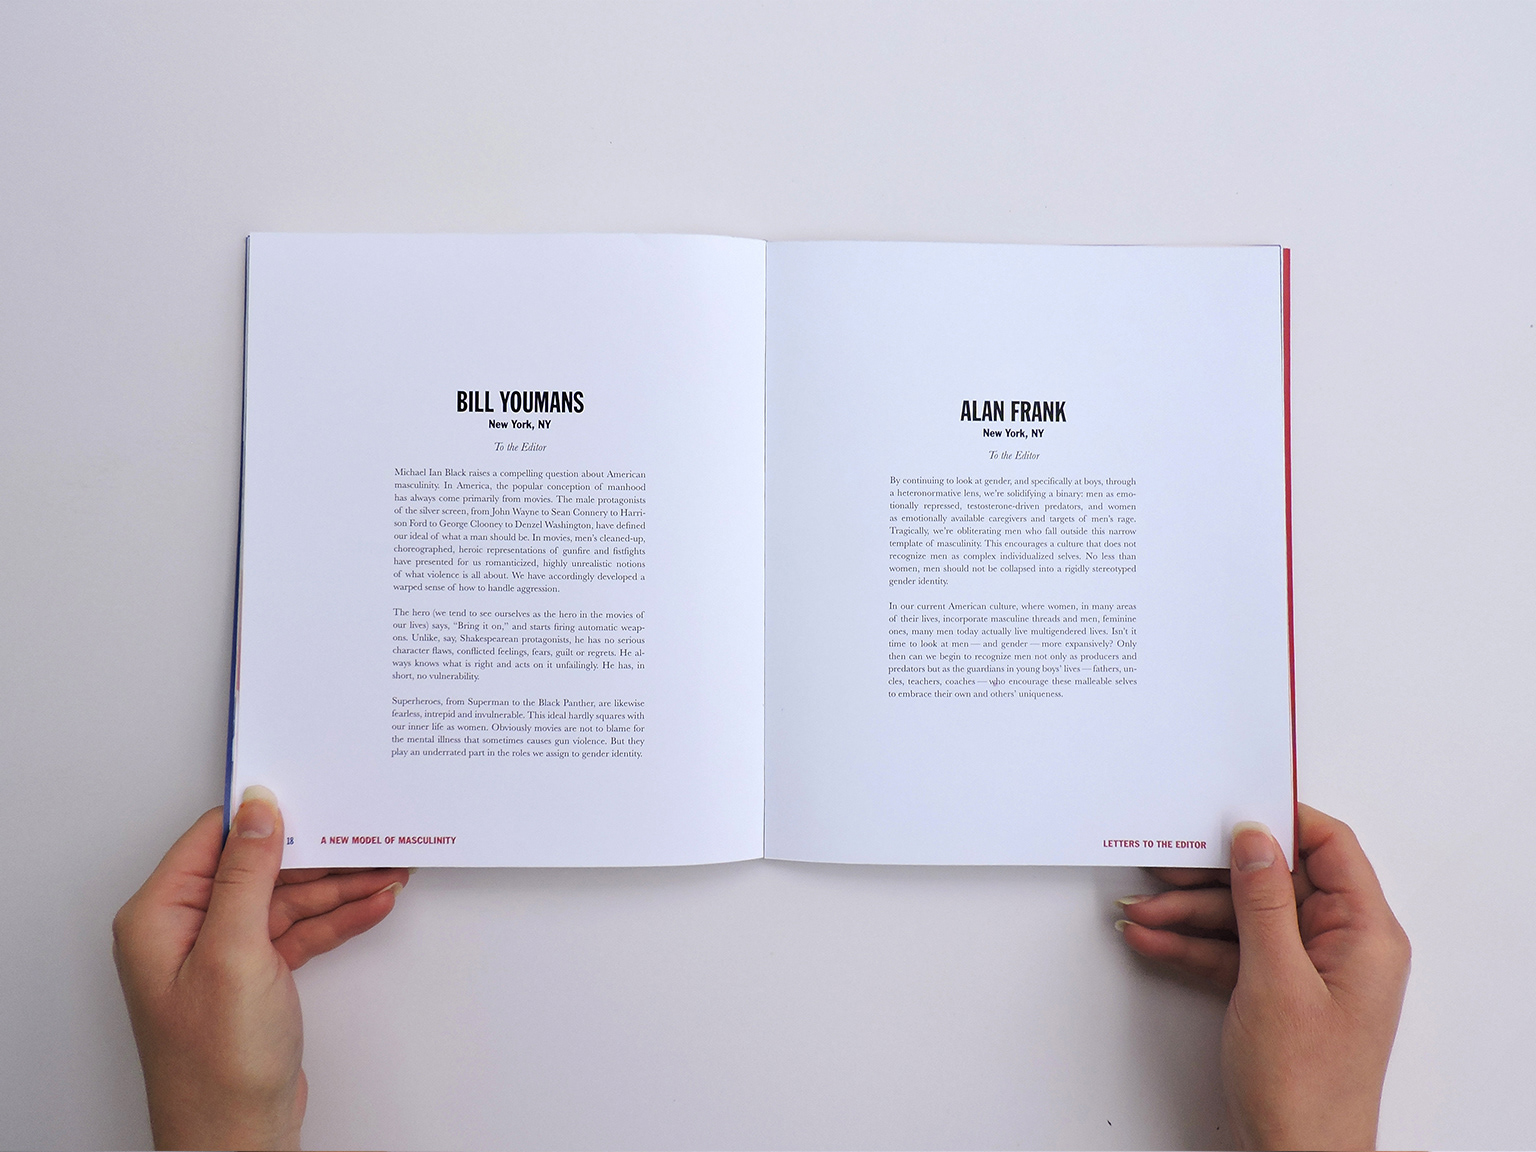 Jack Frischer - Masculinity: An Upside Down Definition